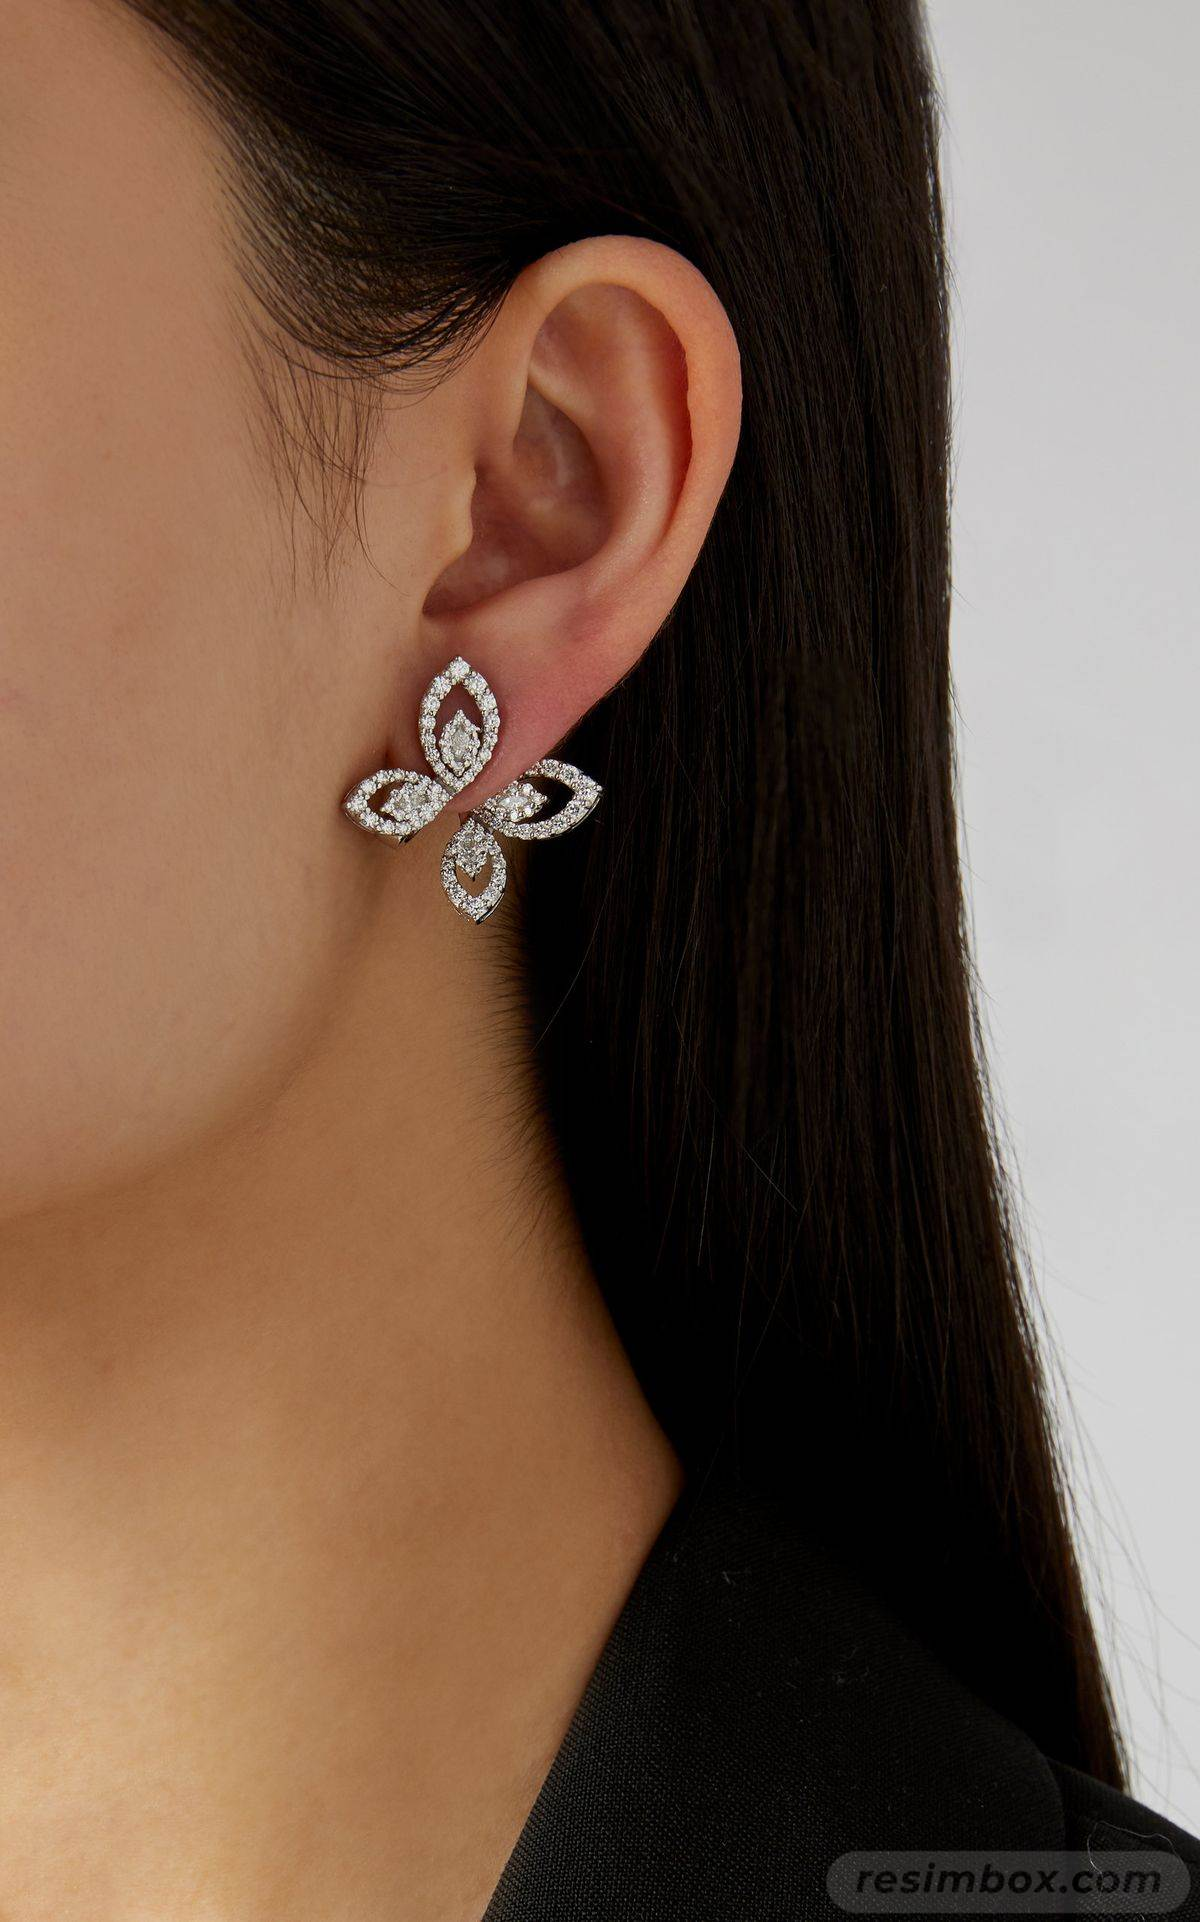 beautiful jewelry diy-176625616624230138